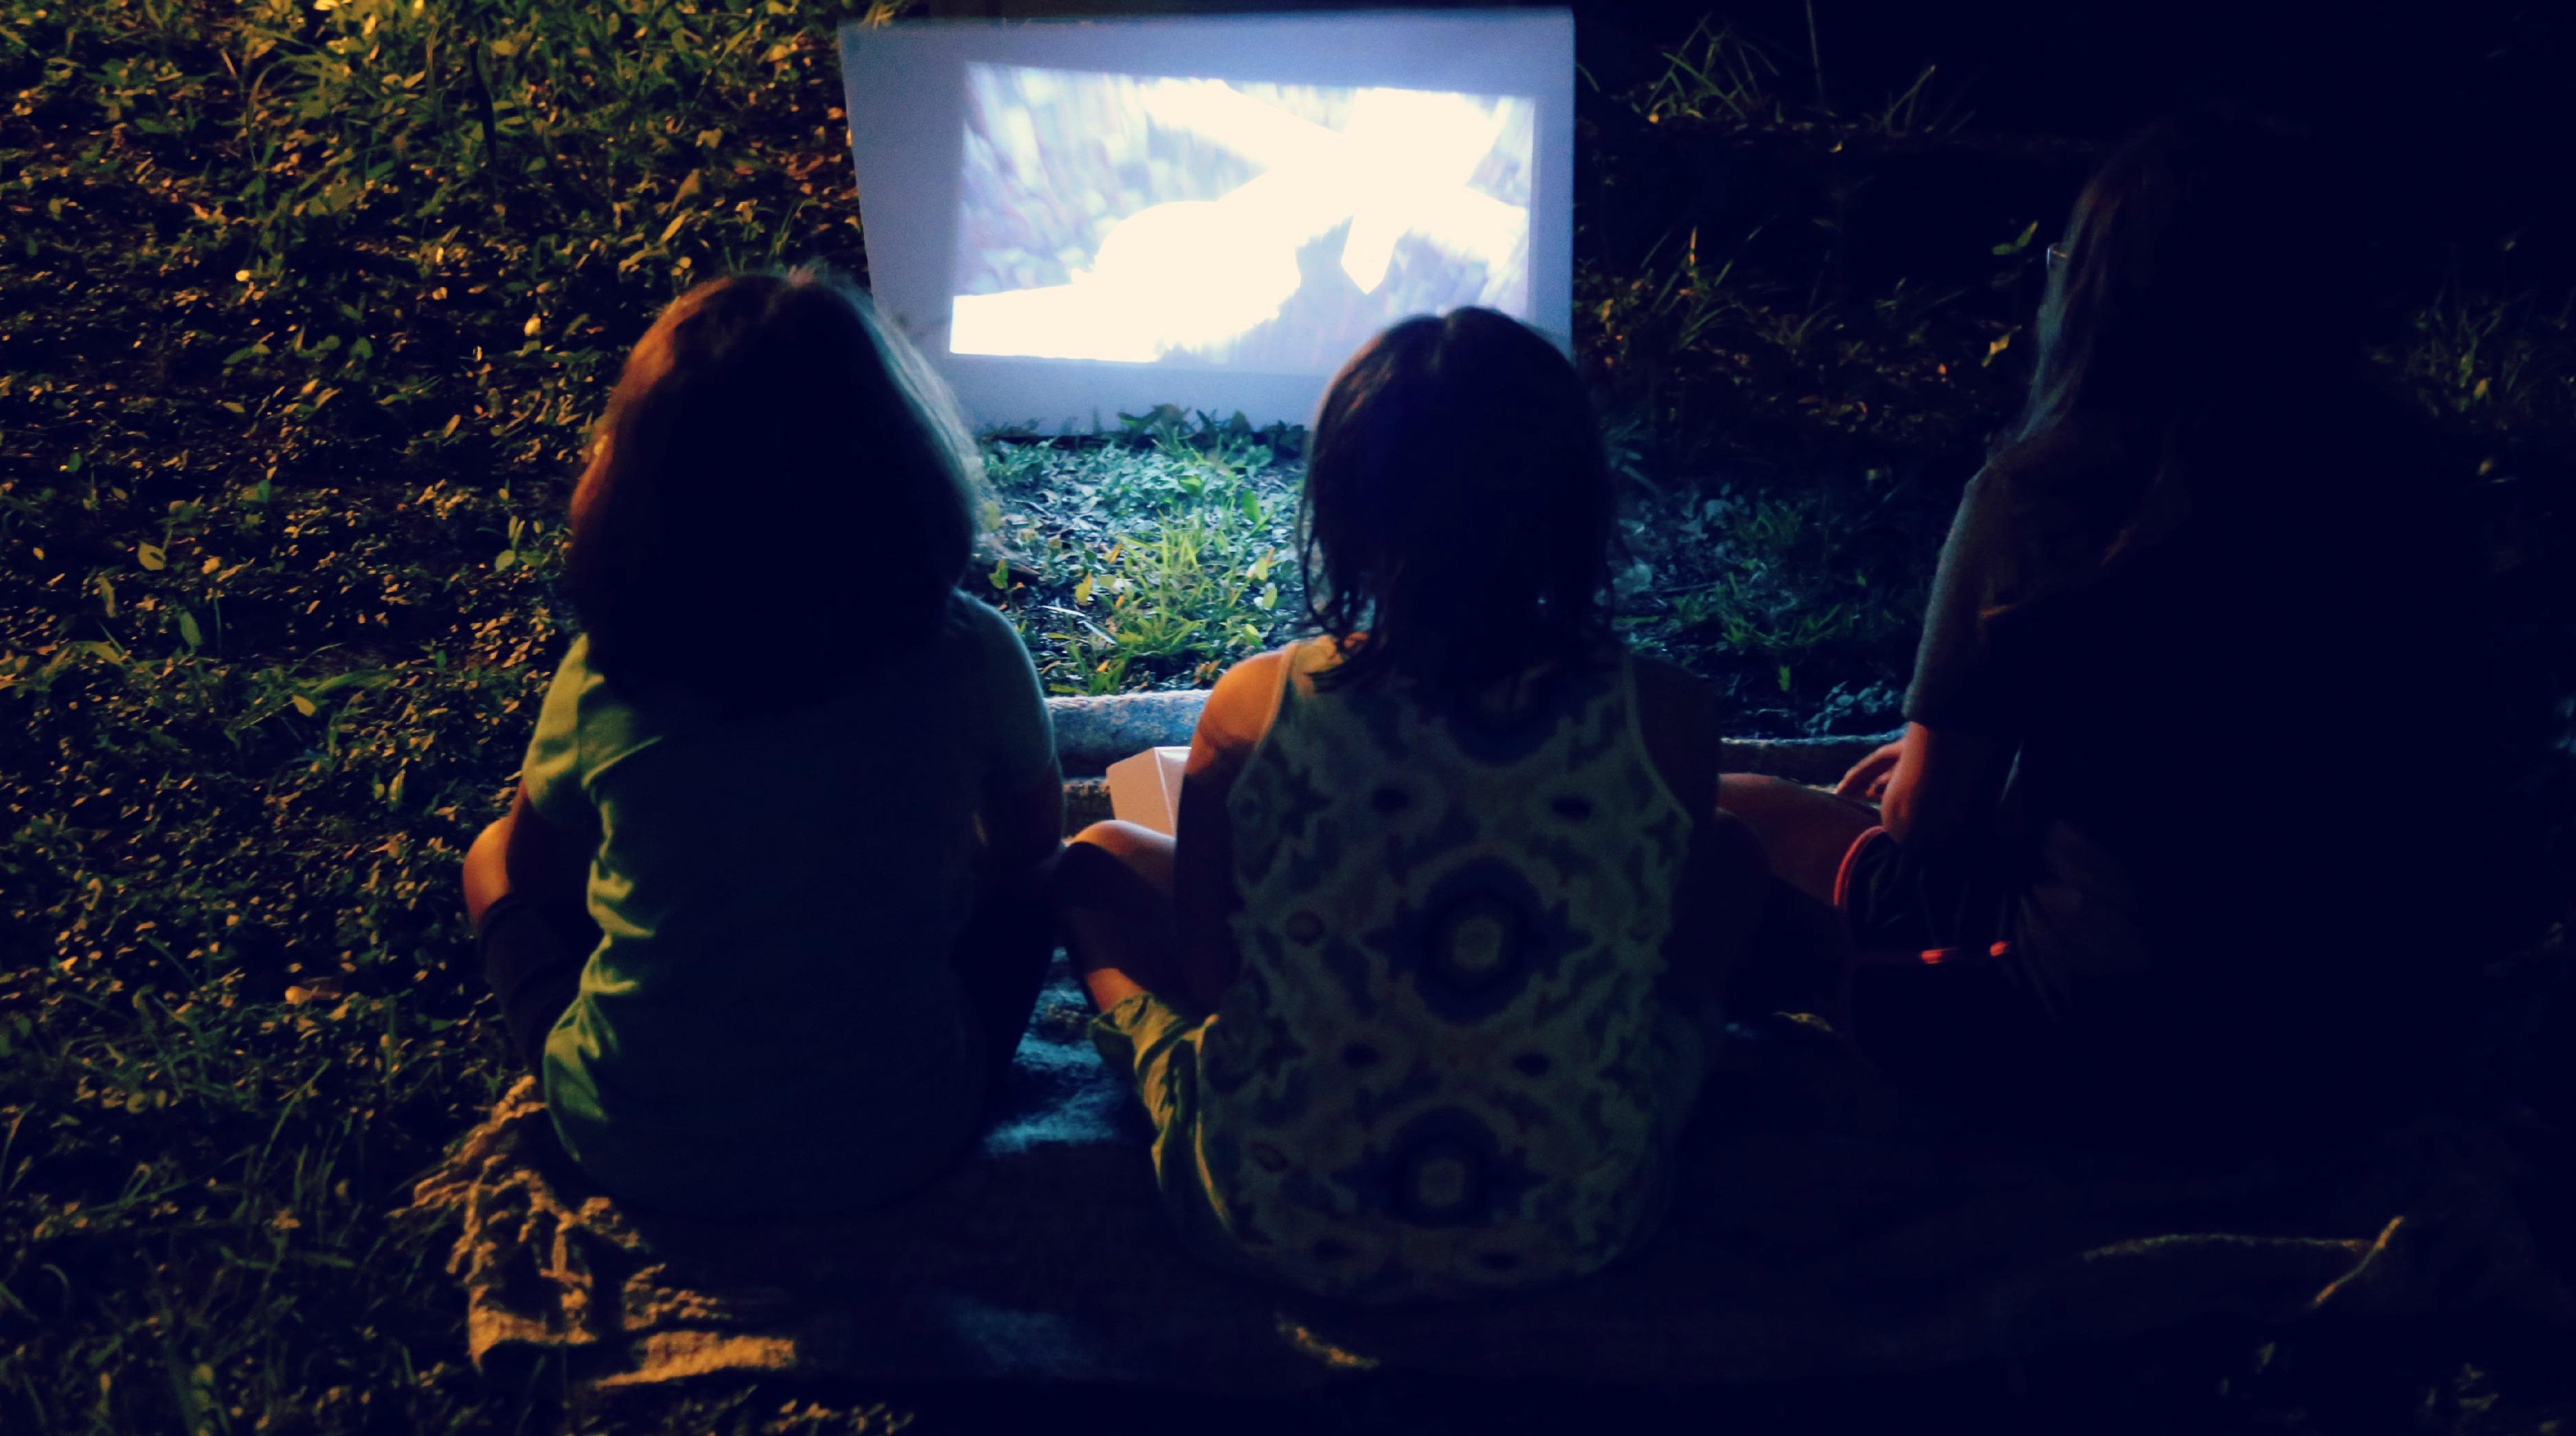 ATT-movie-night-camping-vianneyrodriguez-sweetlifebake